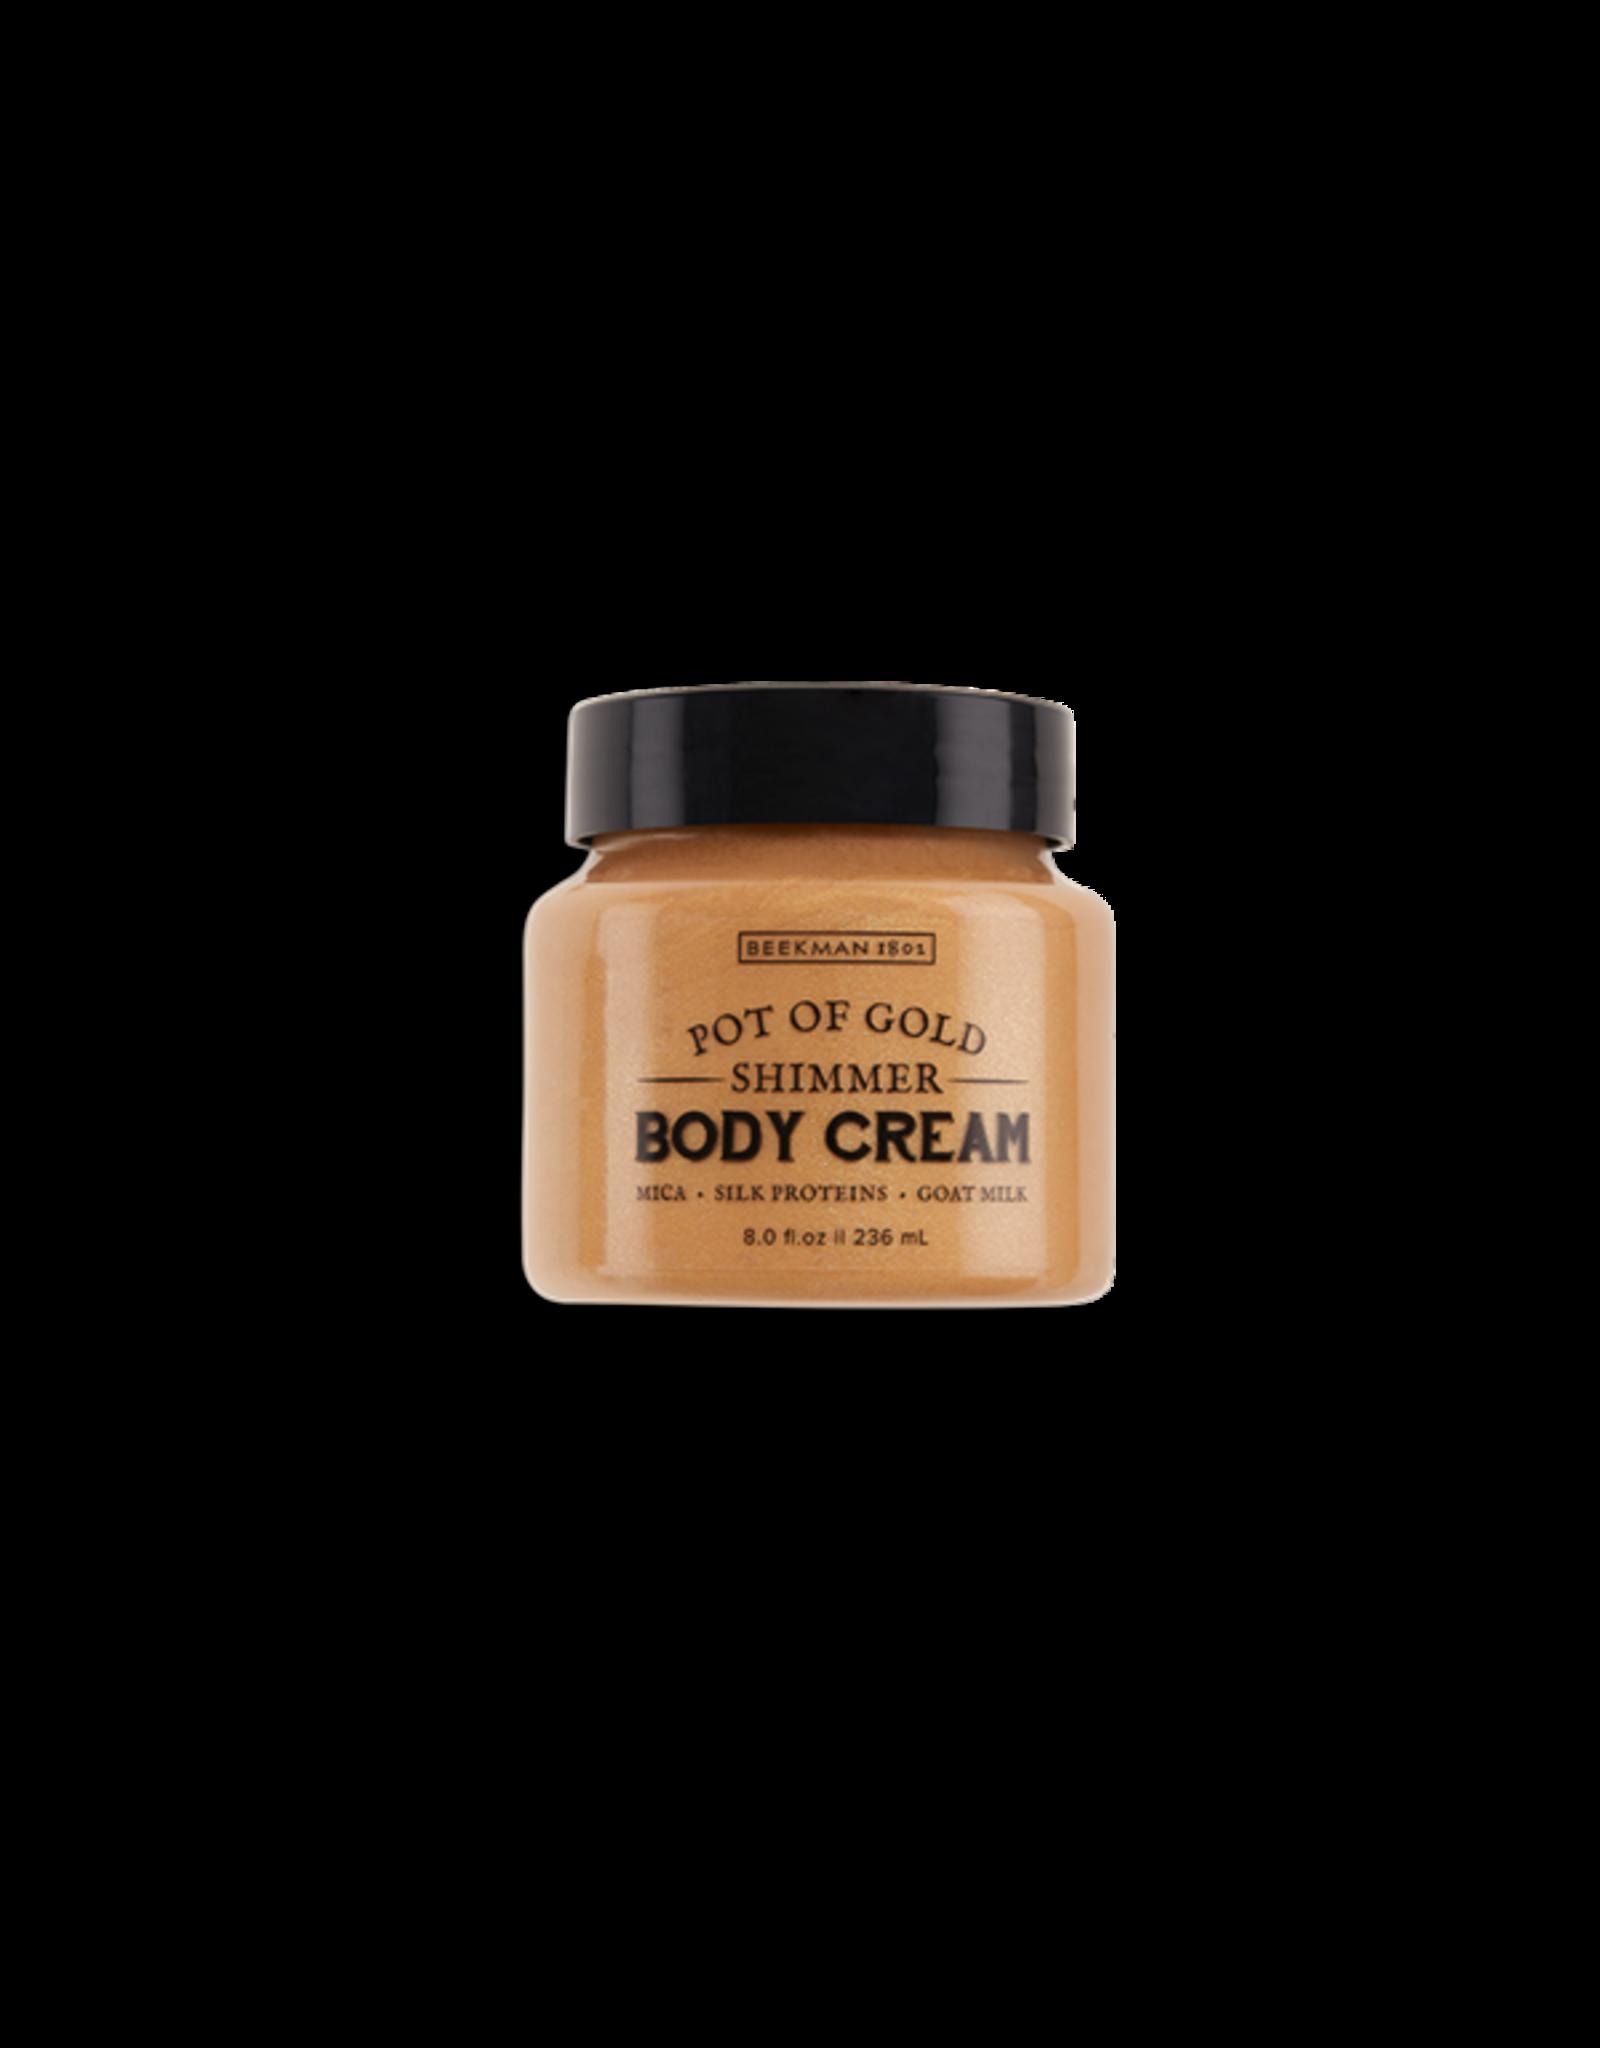 Pot of Gold Shimmer Body Cream